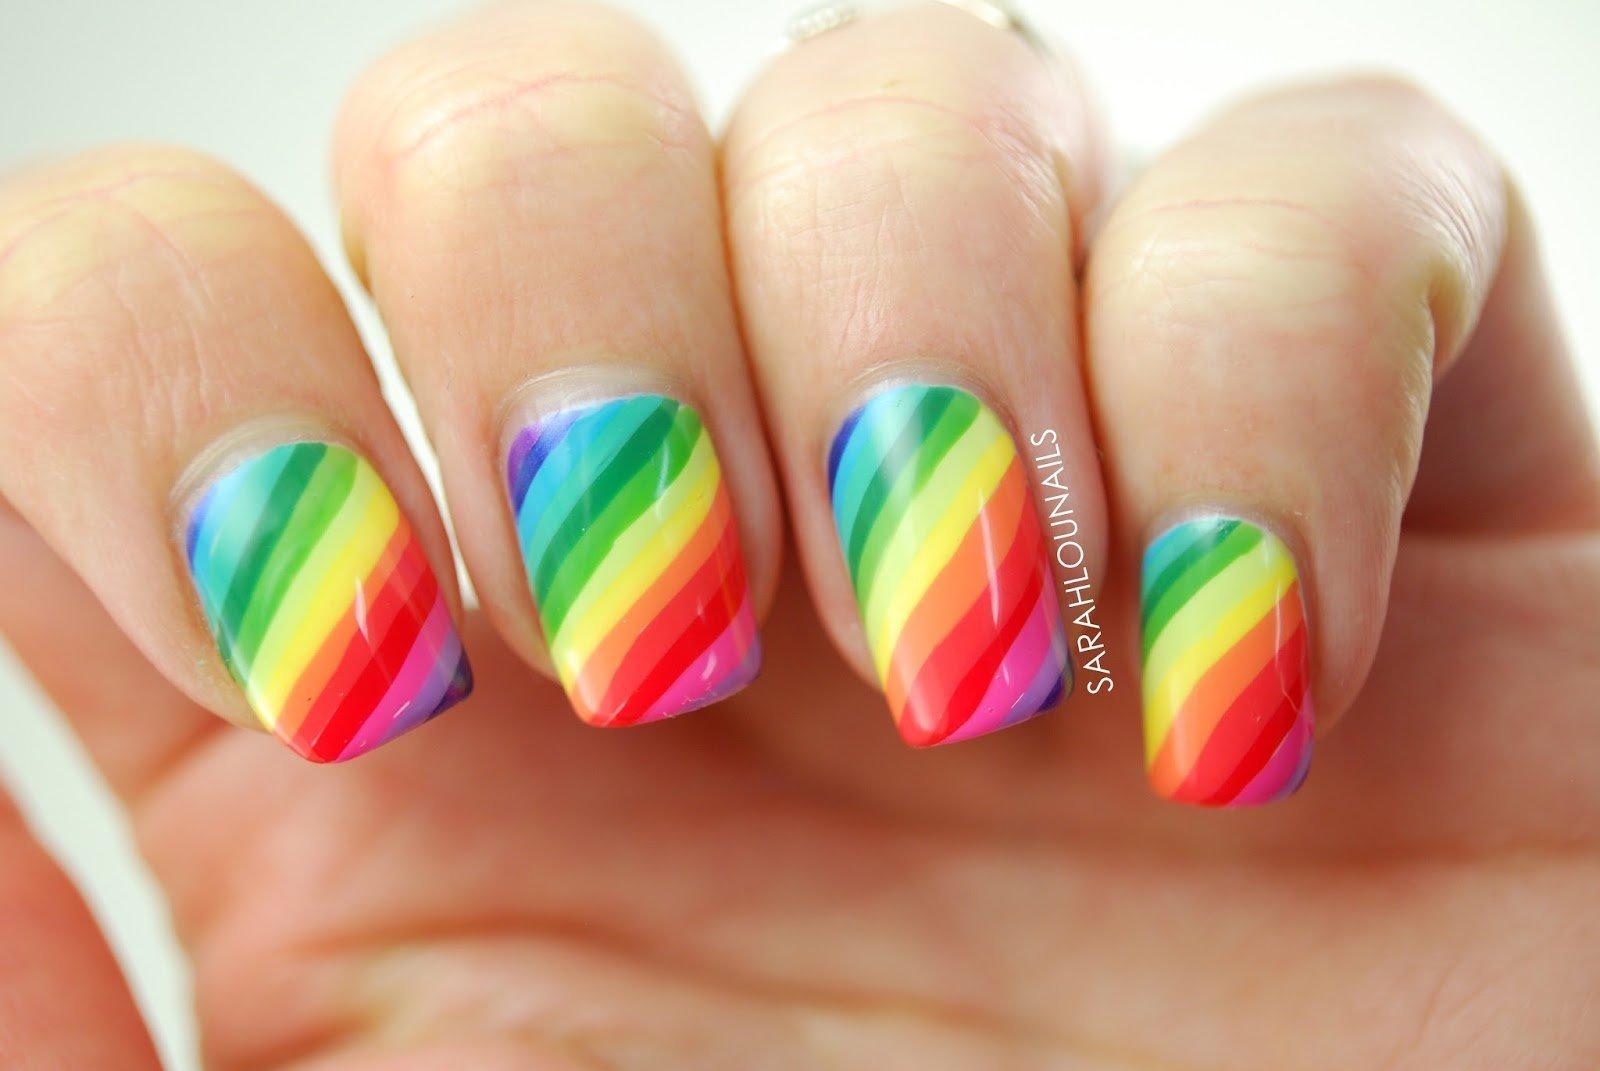 Nail Art | Sarah Lou Nails | Sarah Surette Photography